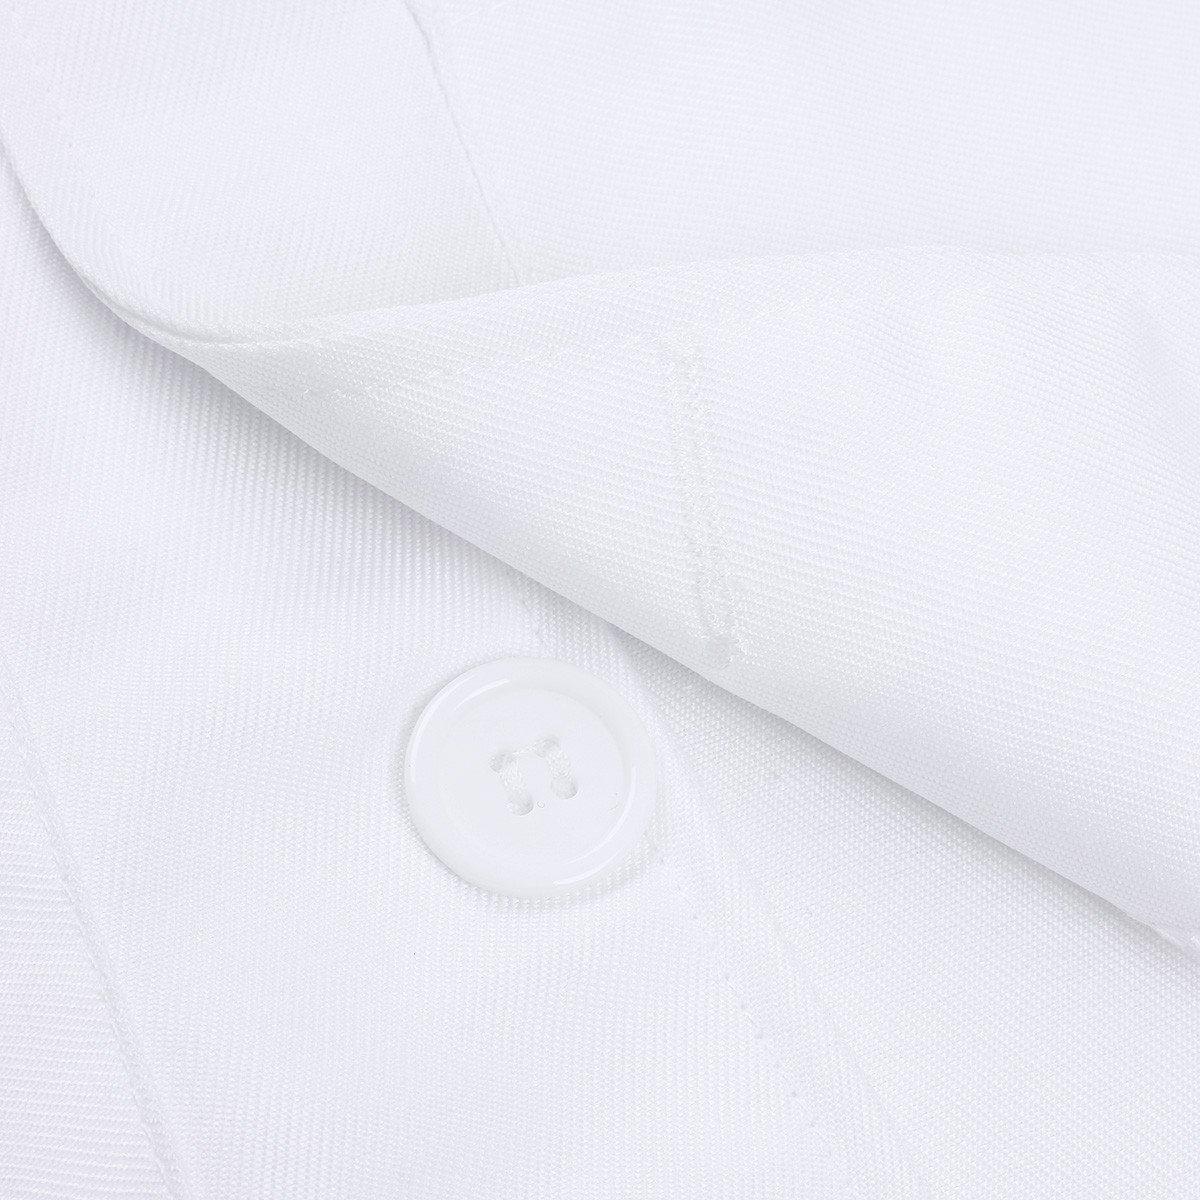 Freebily Scrubs Childrens Lab Coat-Soft Fabric Long Sleeve Doctor Uniform White Cosplay Dress up Costume White 4-5 by Freebily (Image #5)